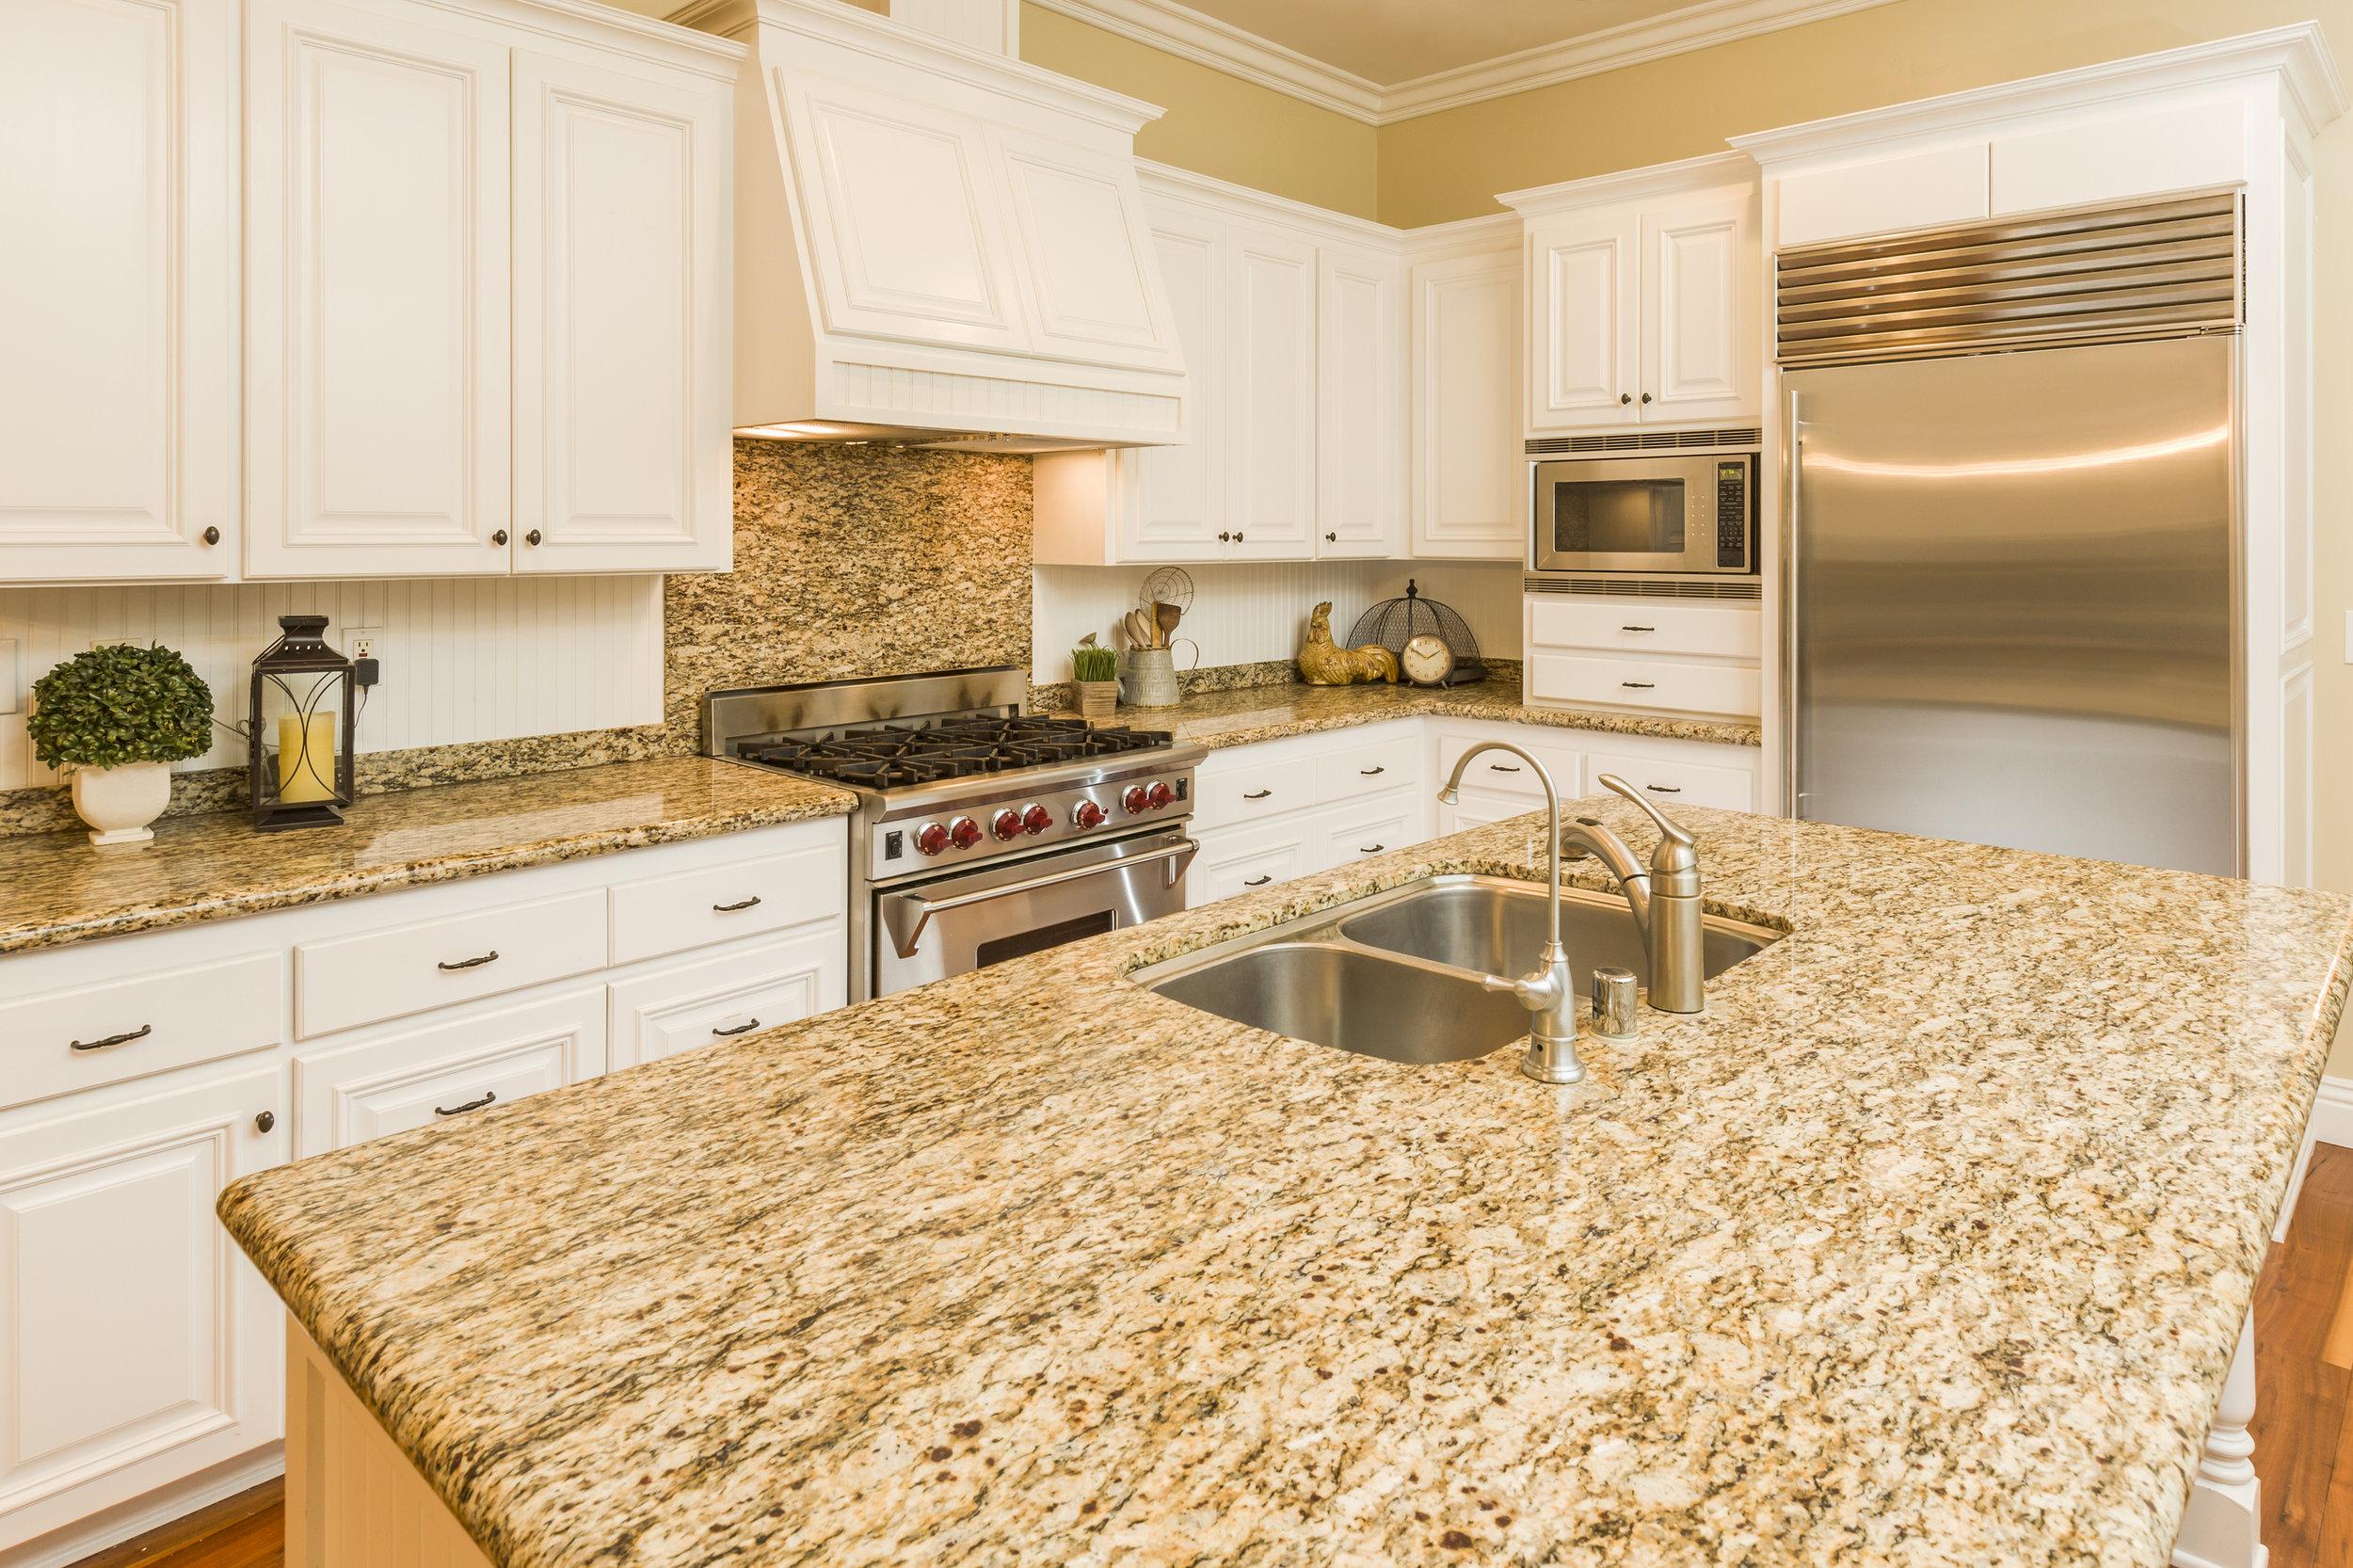 bigstock-Beautiful-Custom-Kitchen-Inter-113577713.jpg